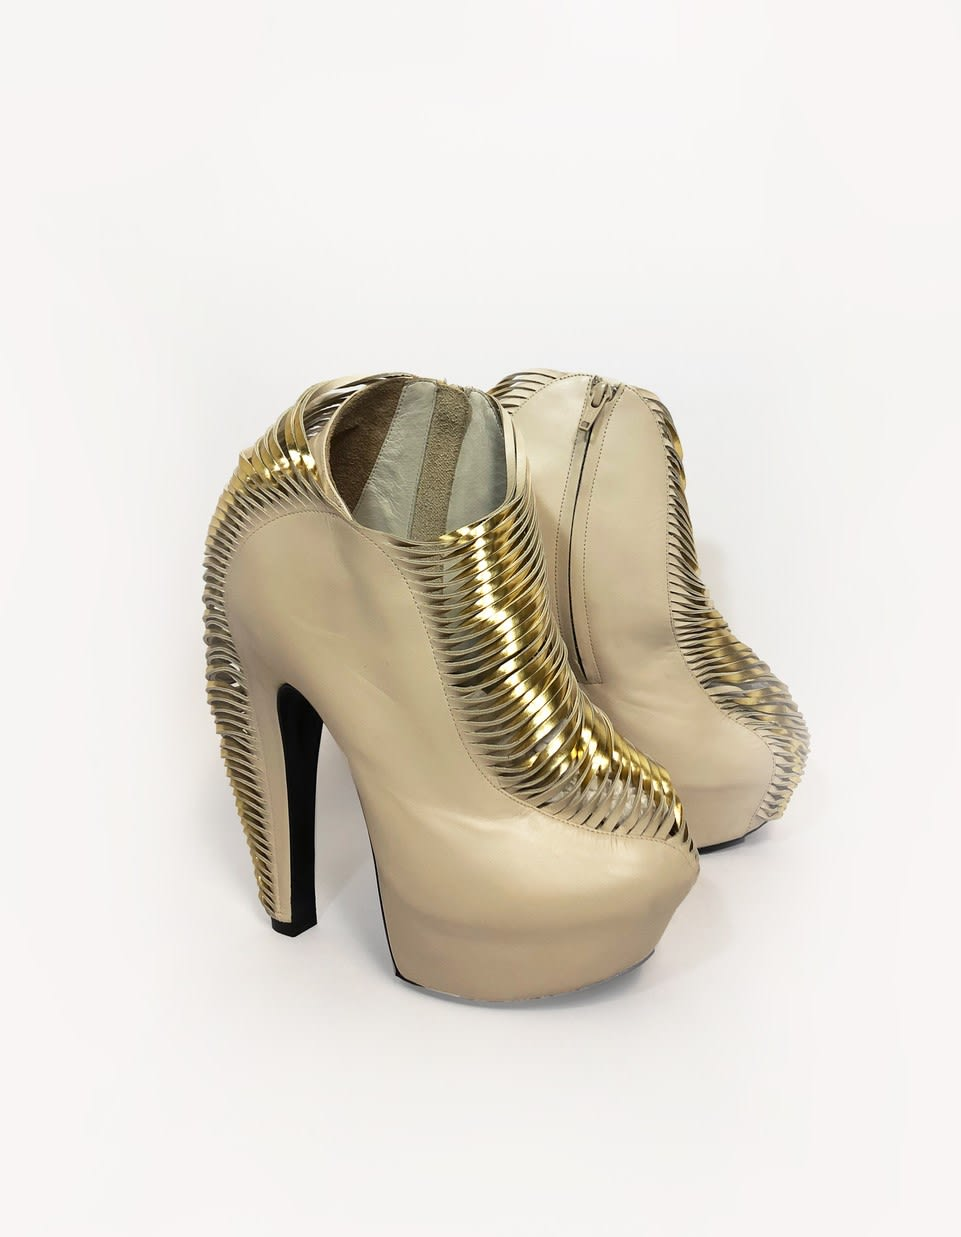 Iris van Herpen, Synesthesia Shoes, 2013